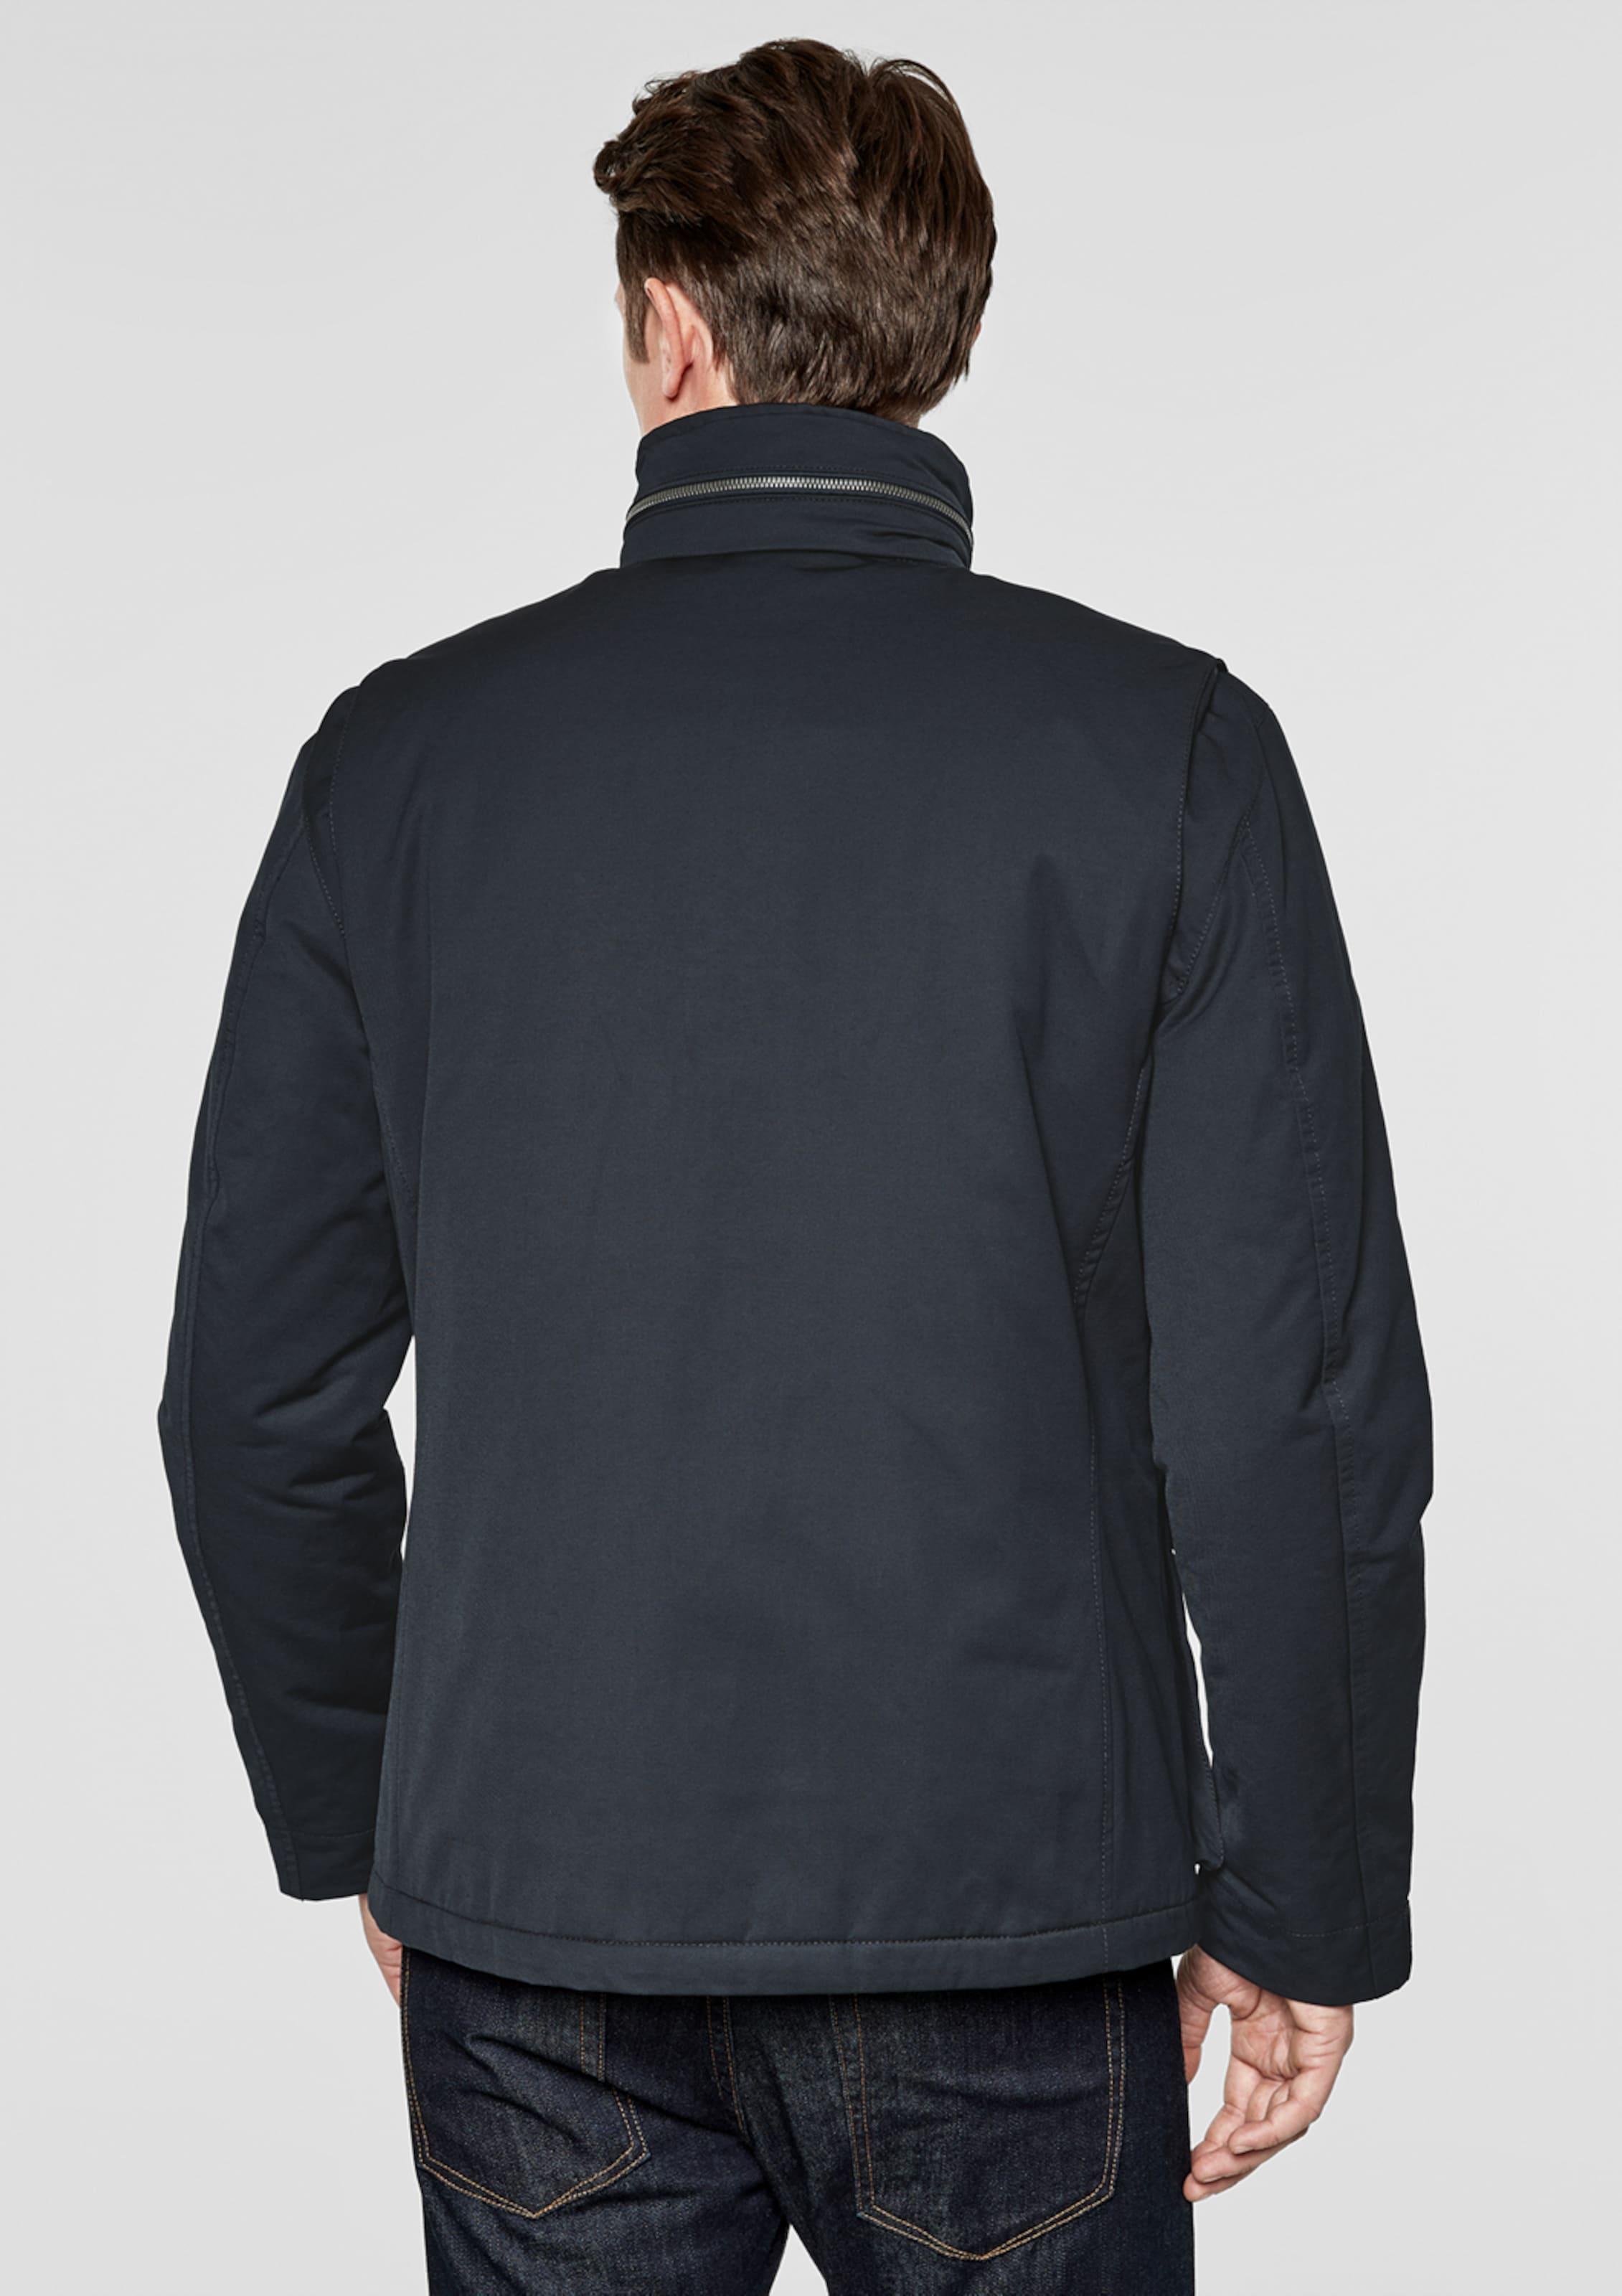 oliver Black Label In Outdoorjacke Nachtblau S Aq5Rj34Lc